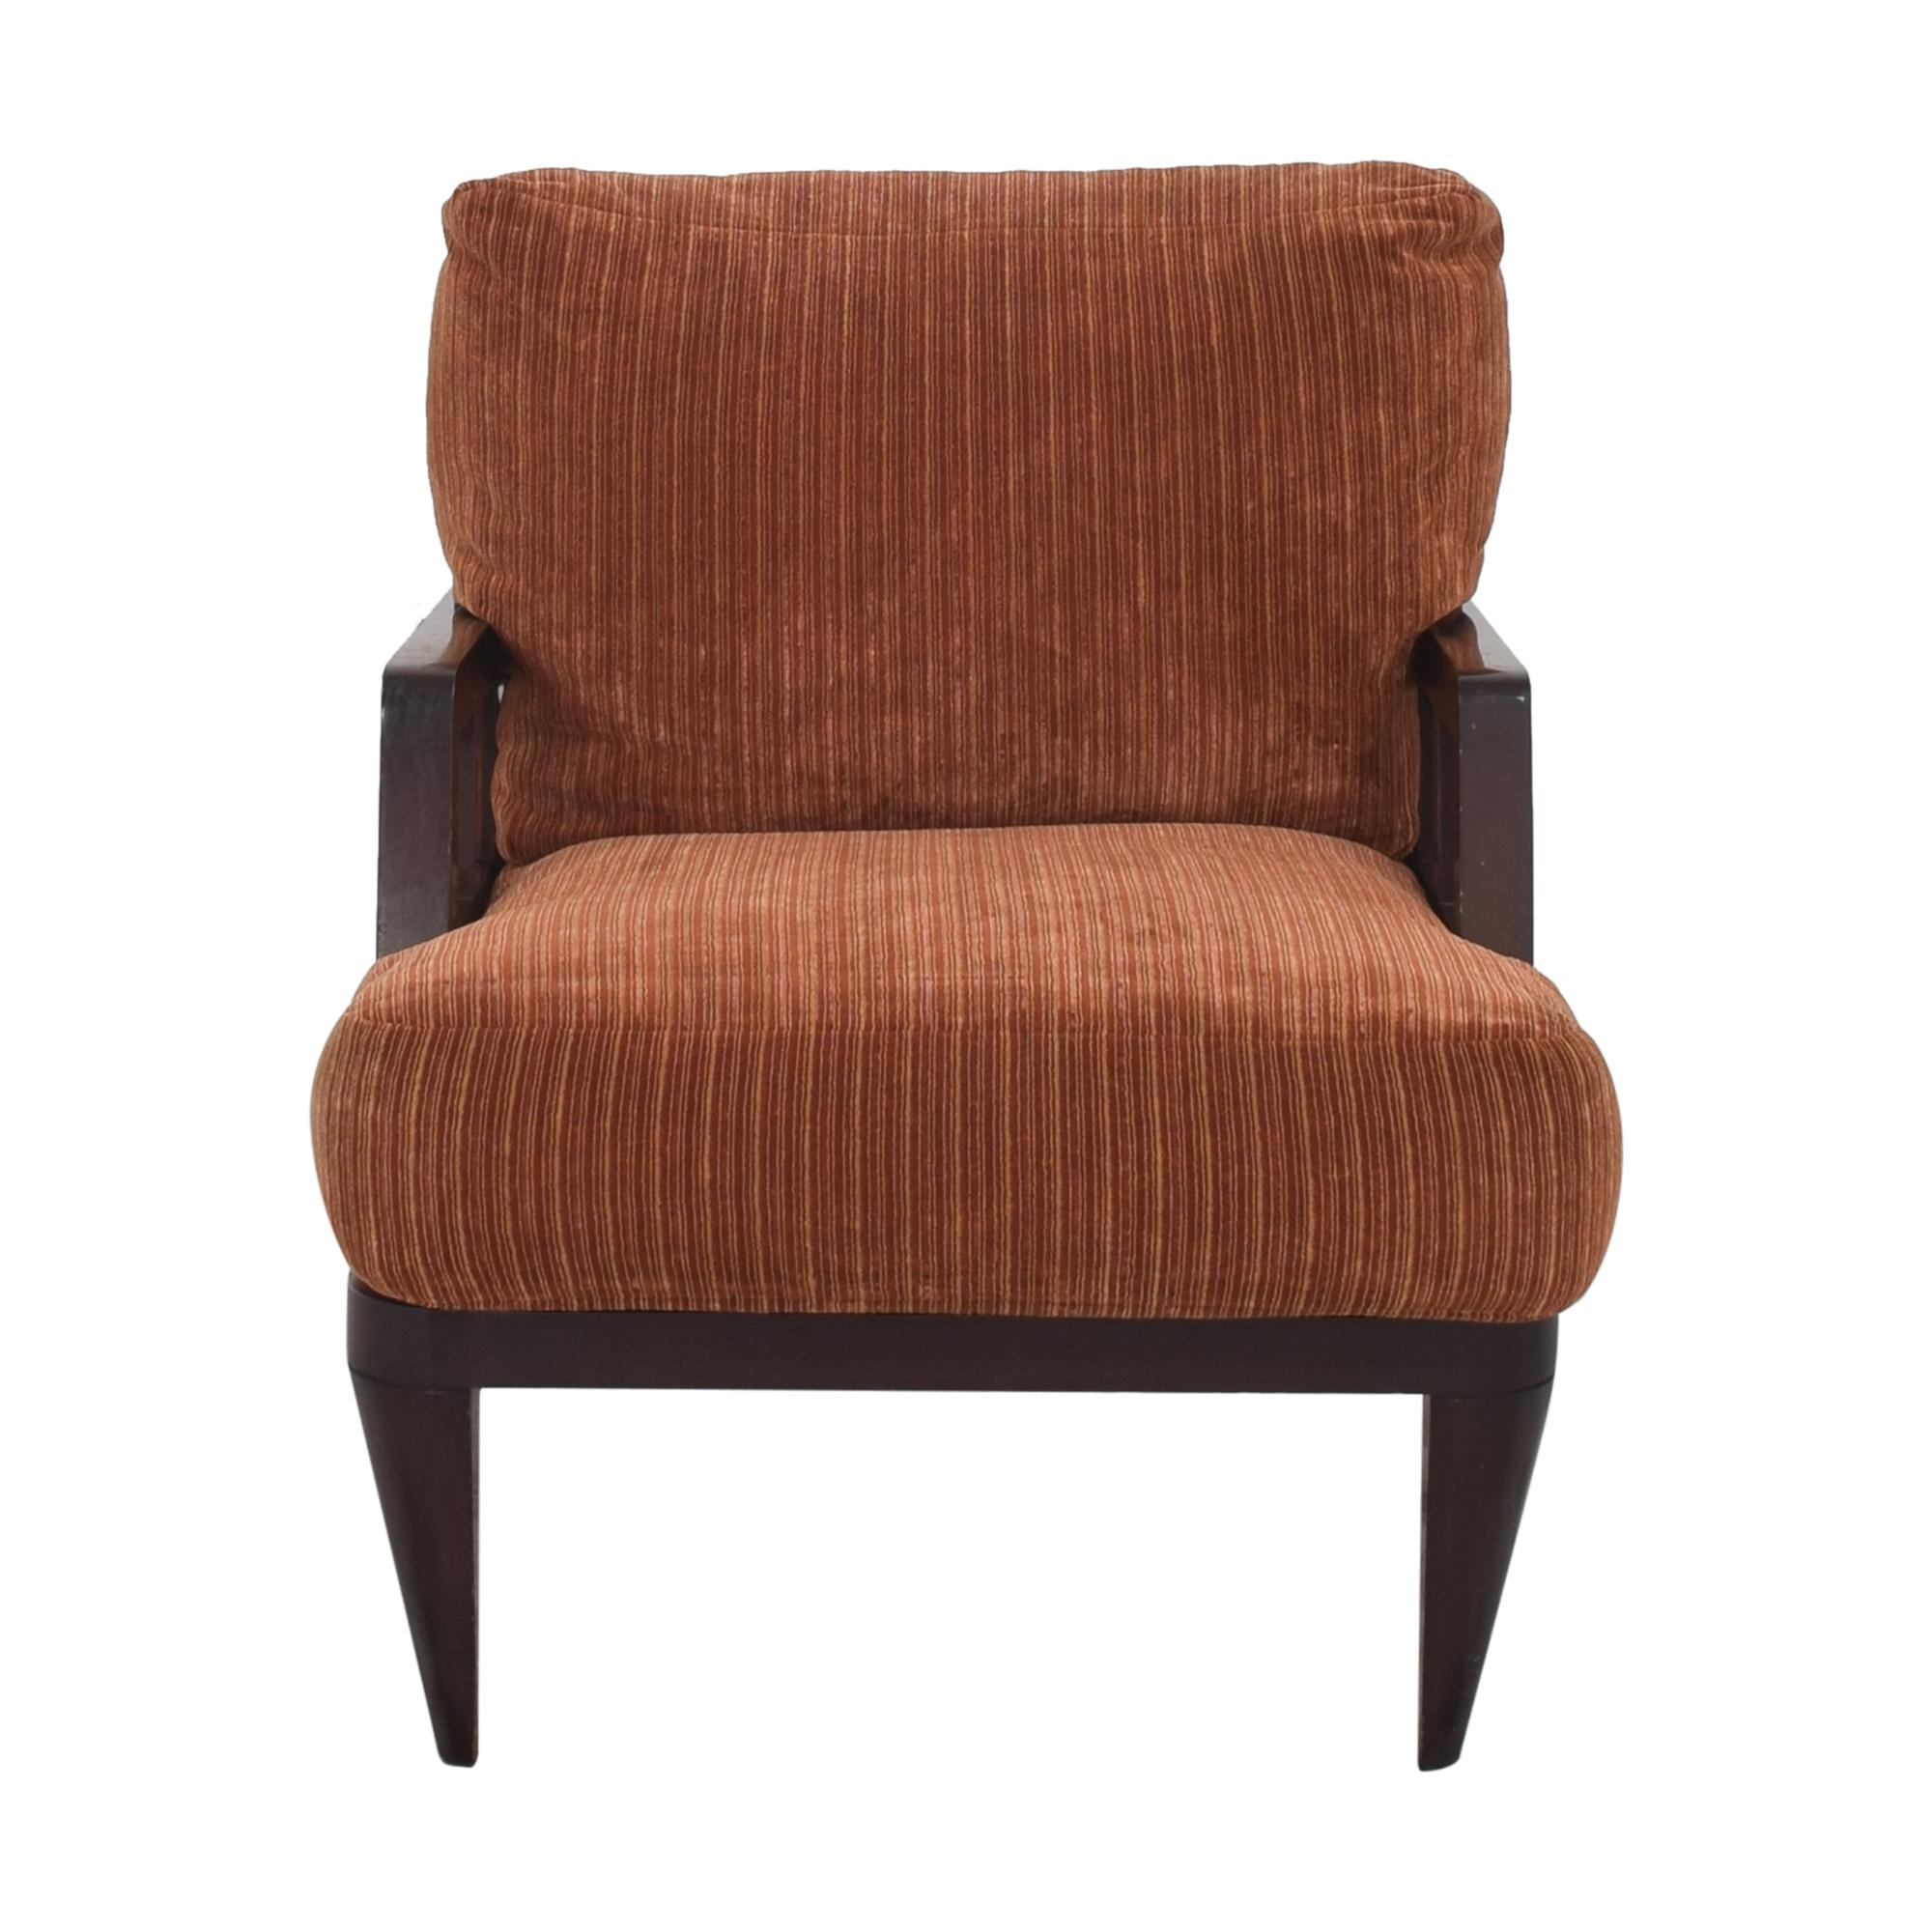 buy Berman | Rosetti Fretwork Lounge Armchair Berman | Rosetti Chairs